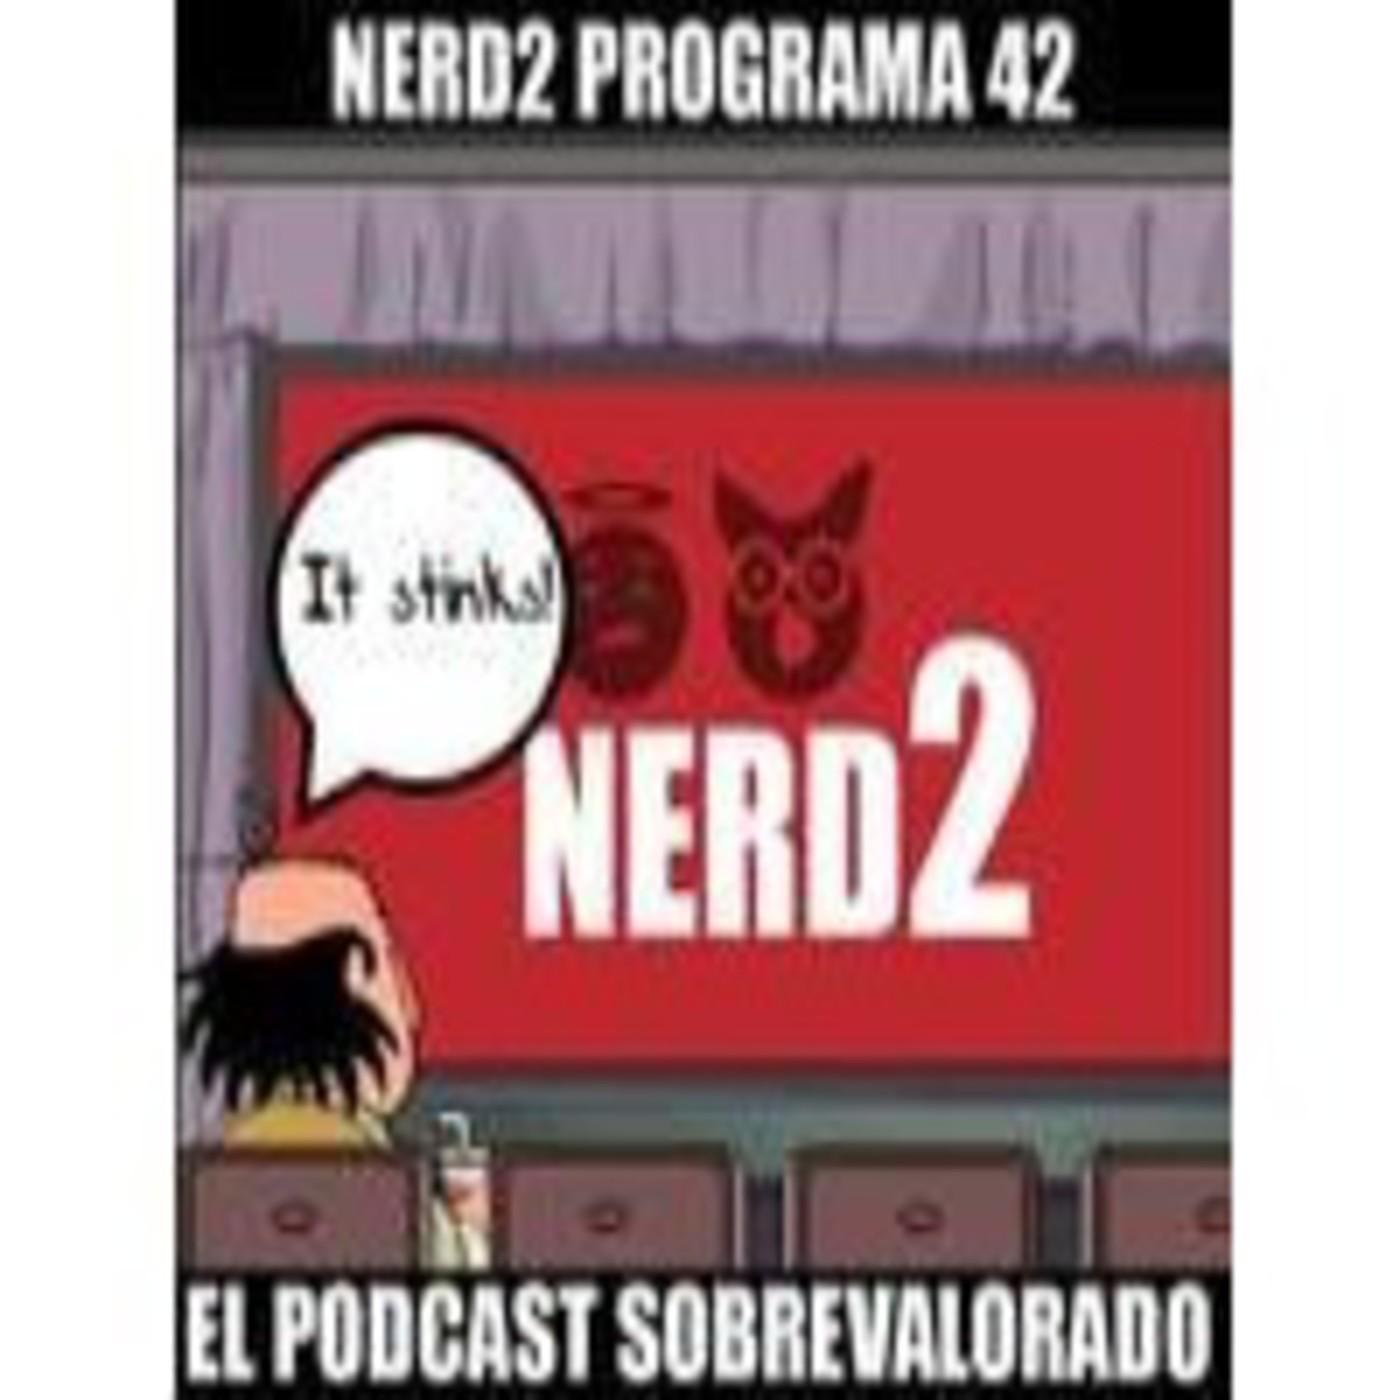 Programa 42 - El Podcast Sobrevalorado